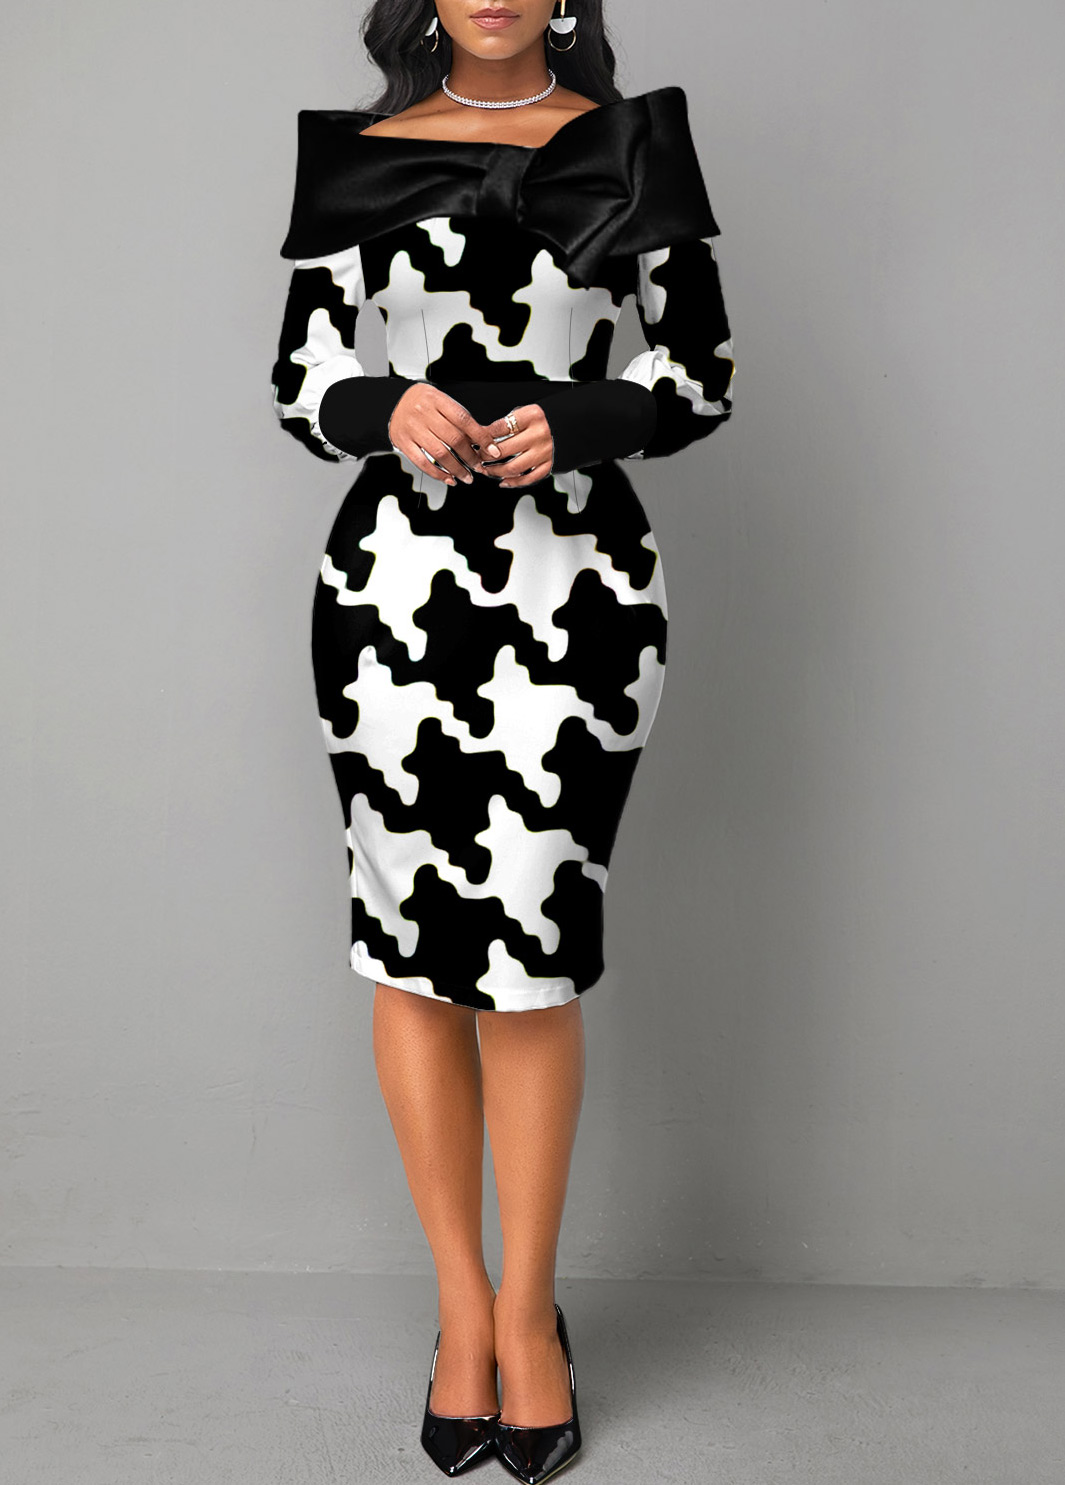 ROTITA Long Sleeve Houndstooth Print Color Block Dress